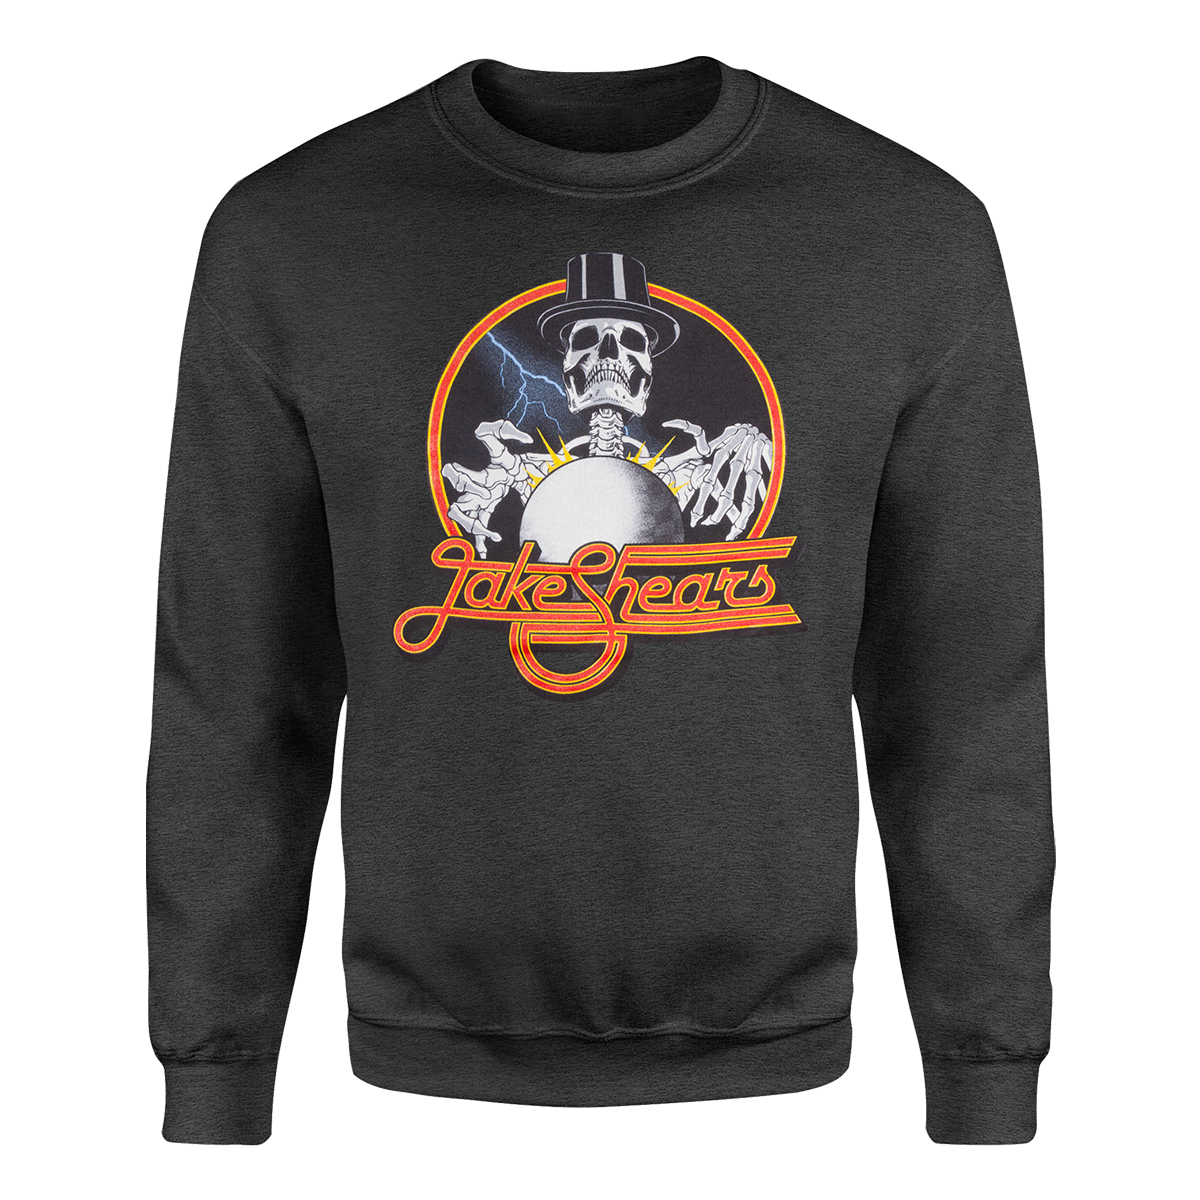 Skeleton Crewneck Sweatshirt